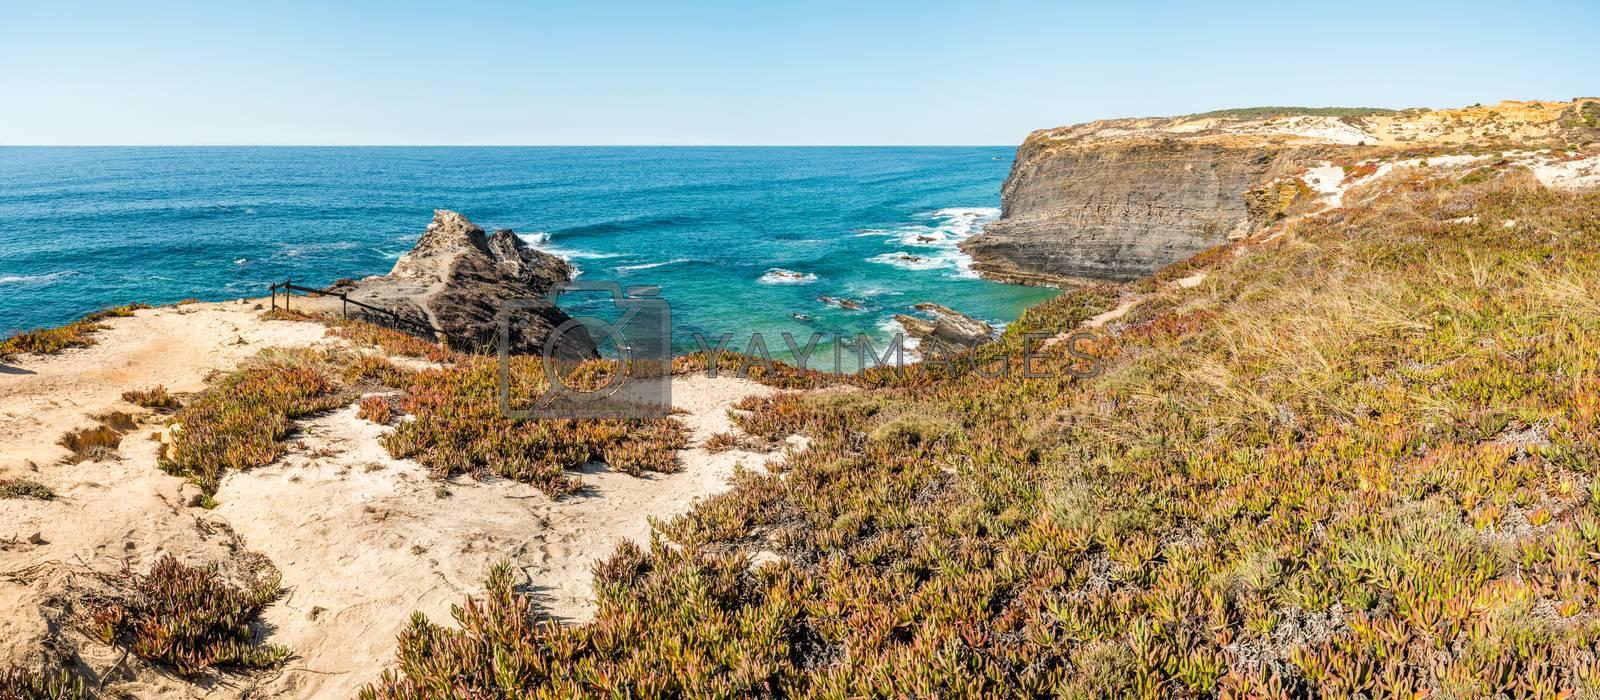 Atlantic ocean coast cliff at Sardao cape (Cabo Sardao) Alentejo Portugal.